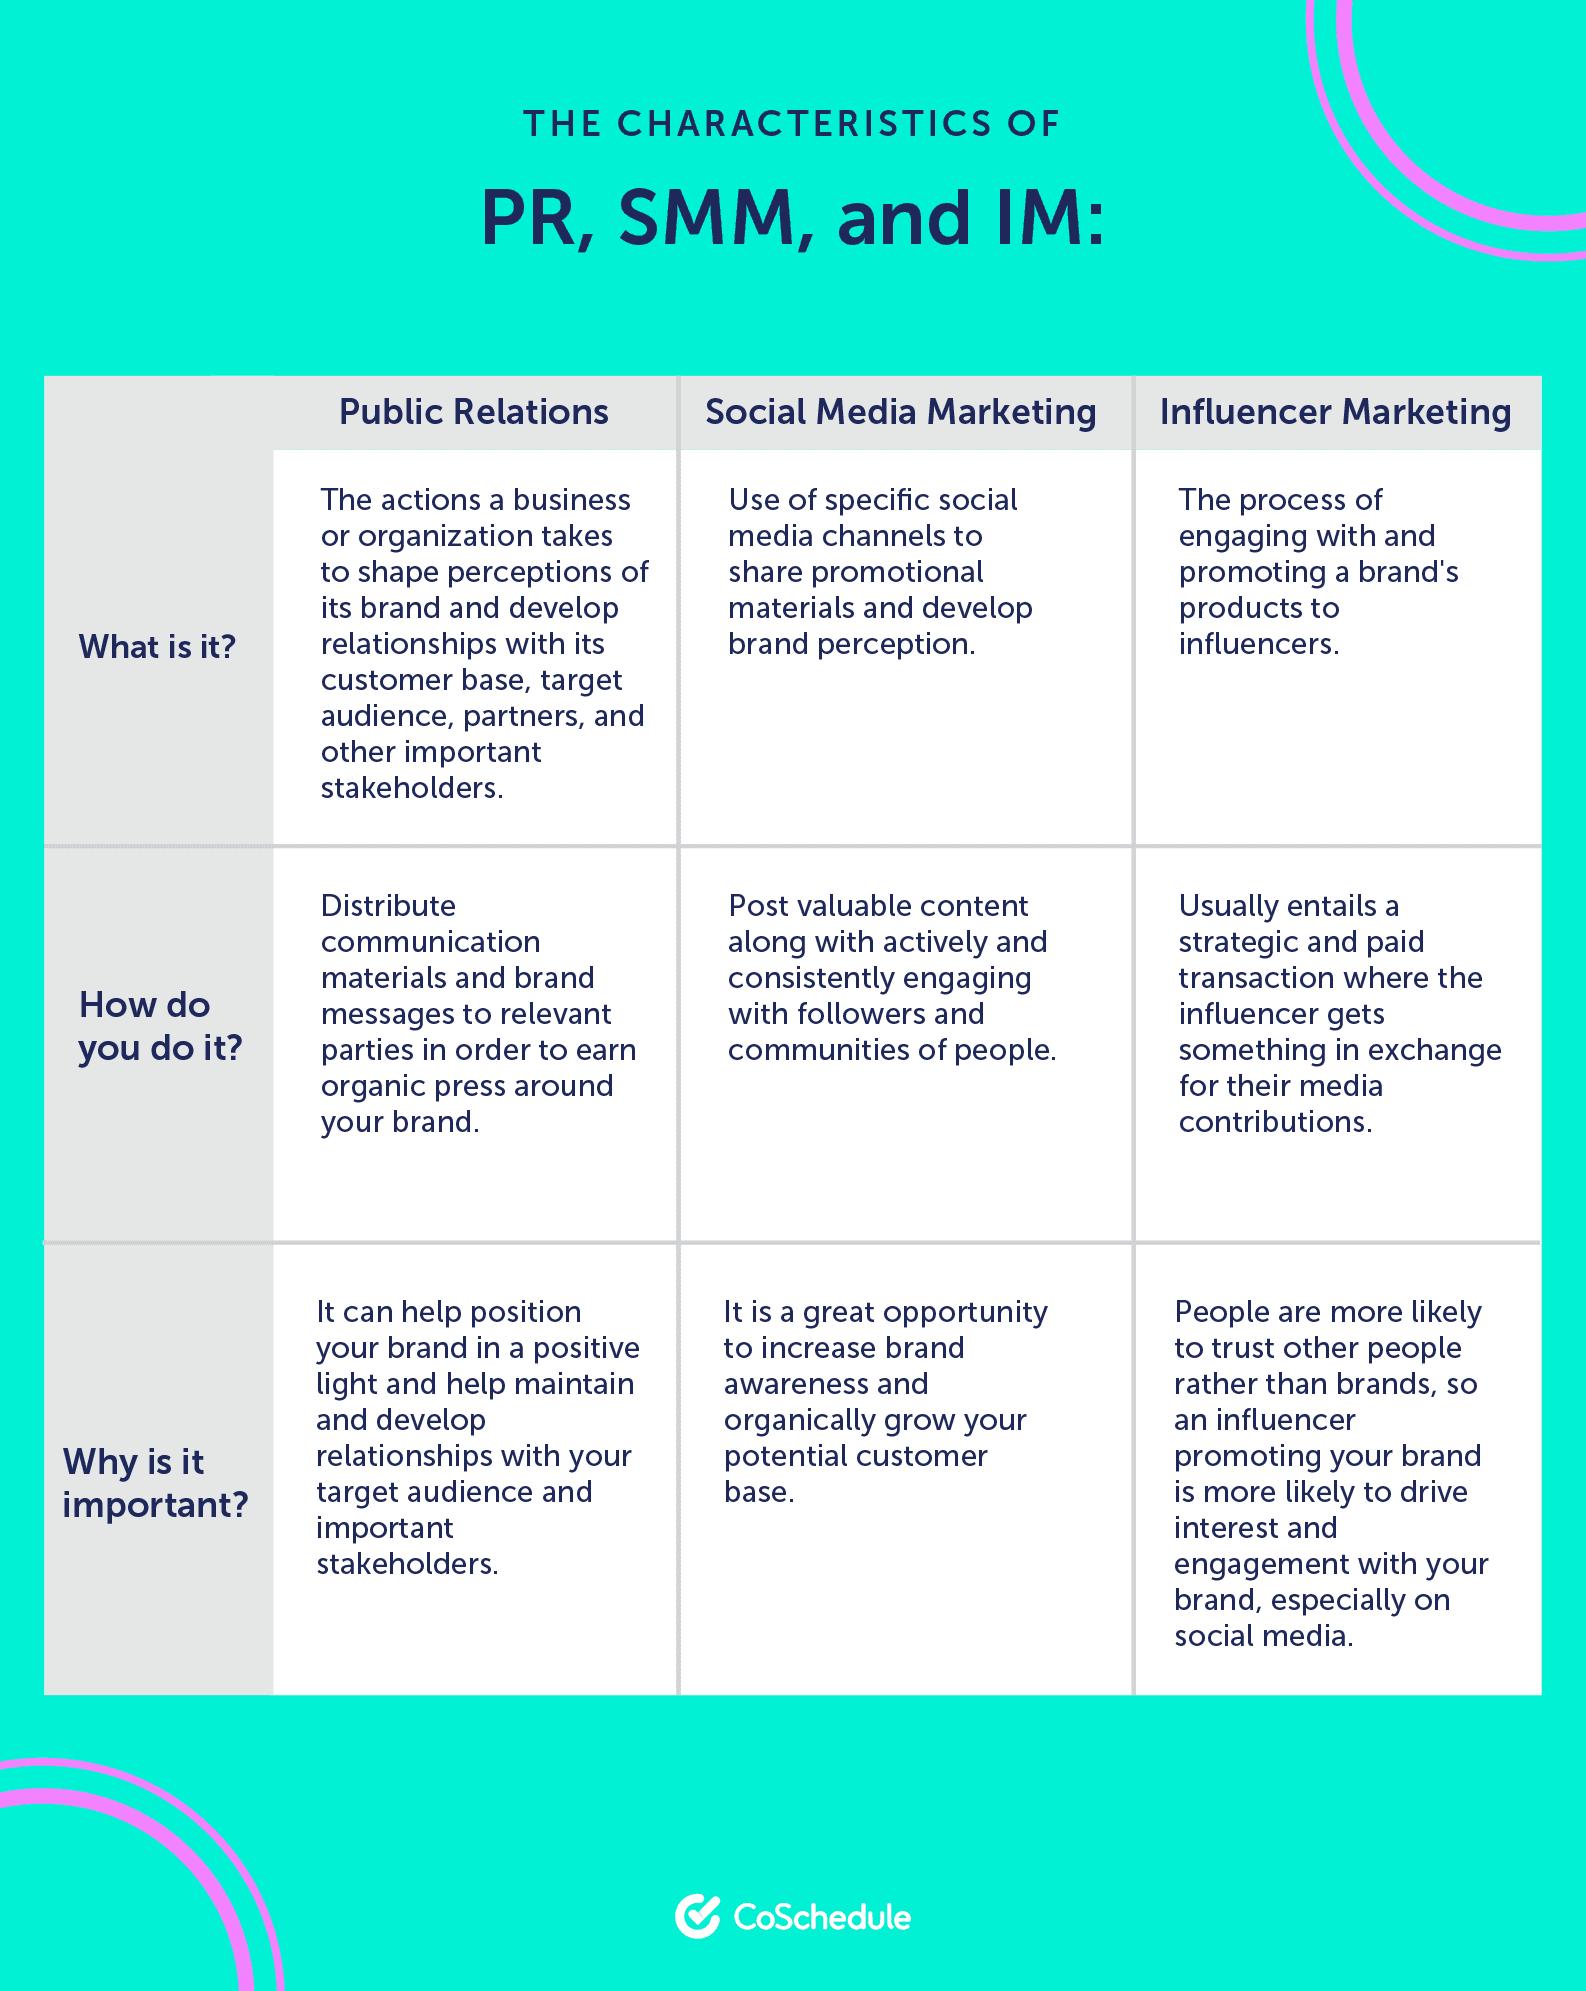 PR, SMM, & IM characteristics